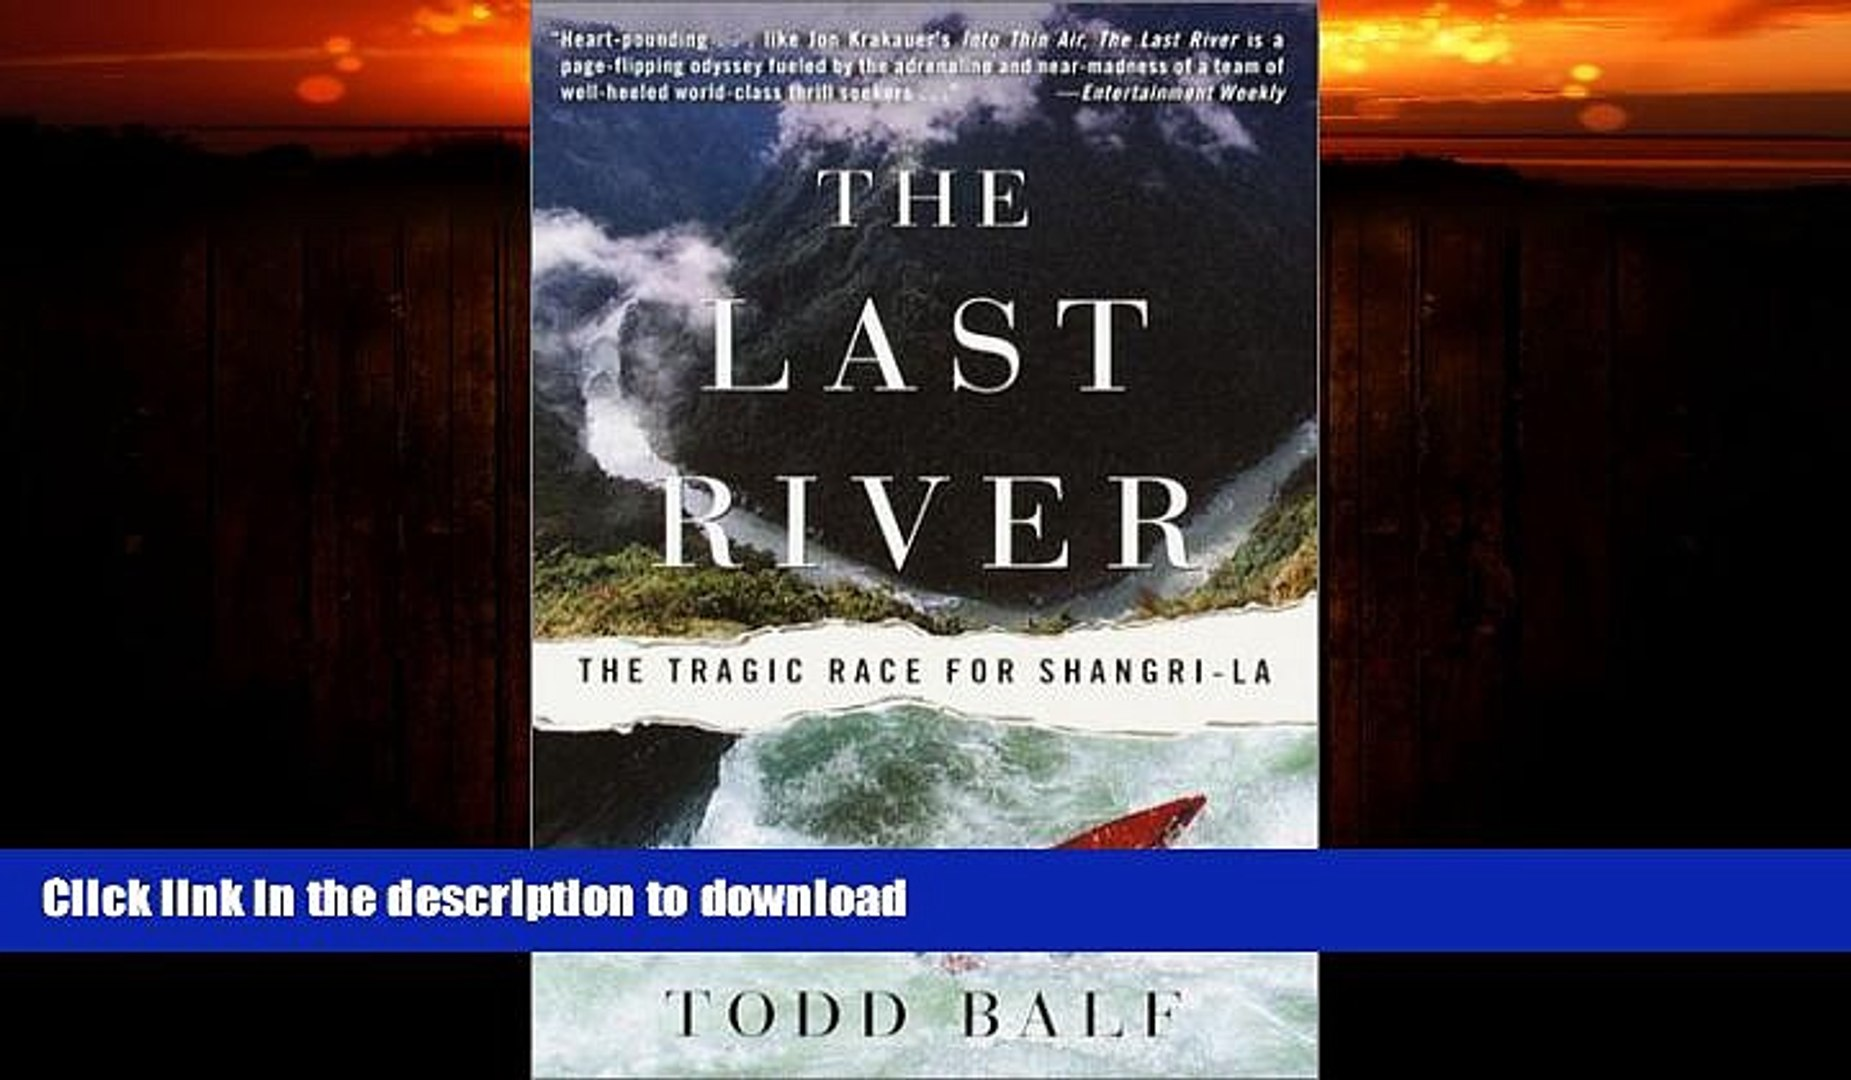 GET PDF  The Last River: The Tragic Race for Shangri-la  BOOK ONLINE